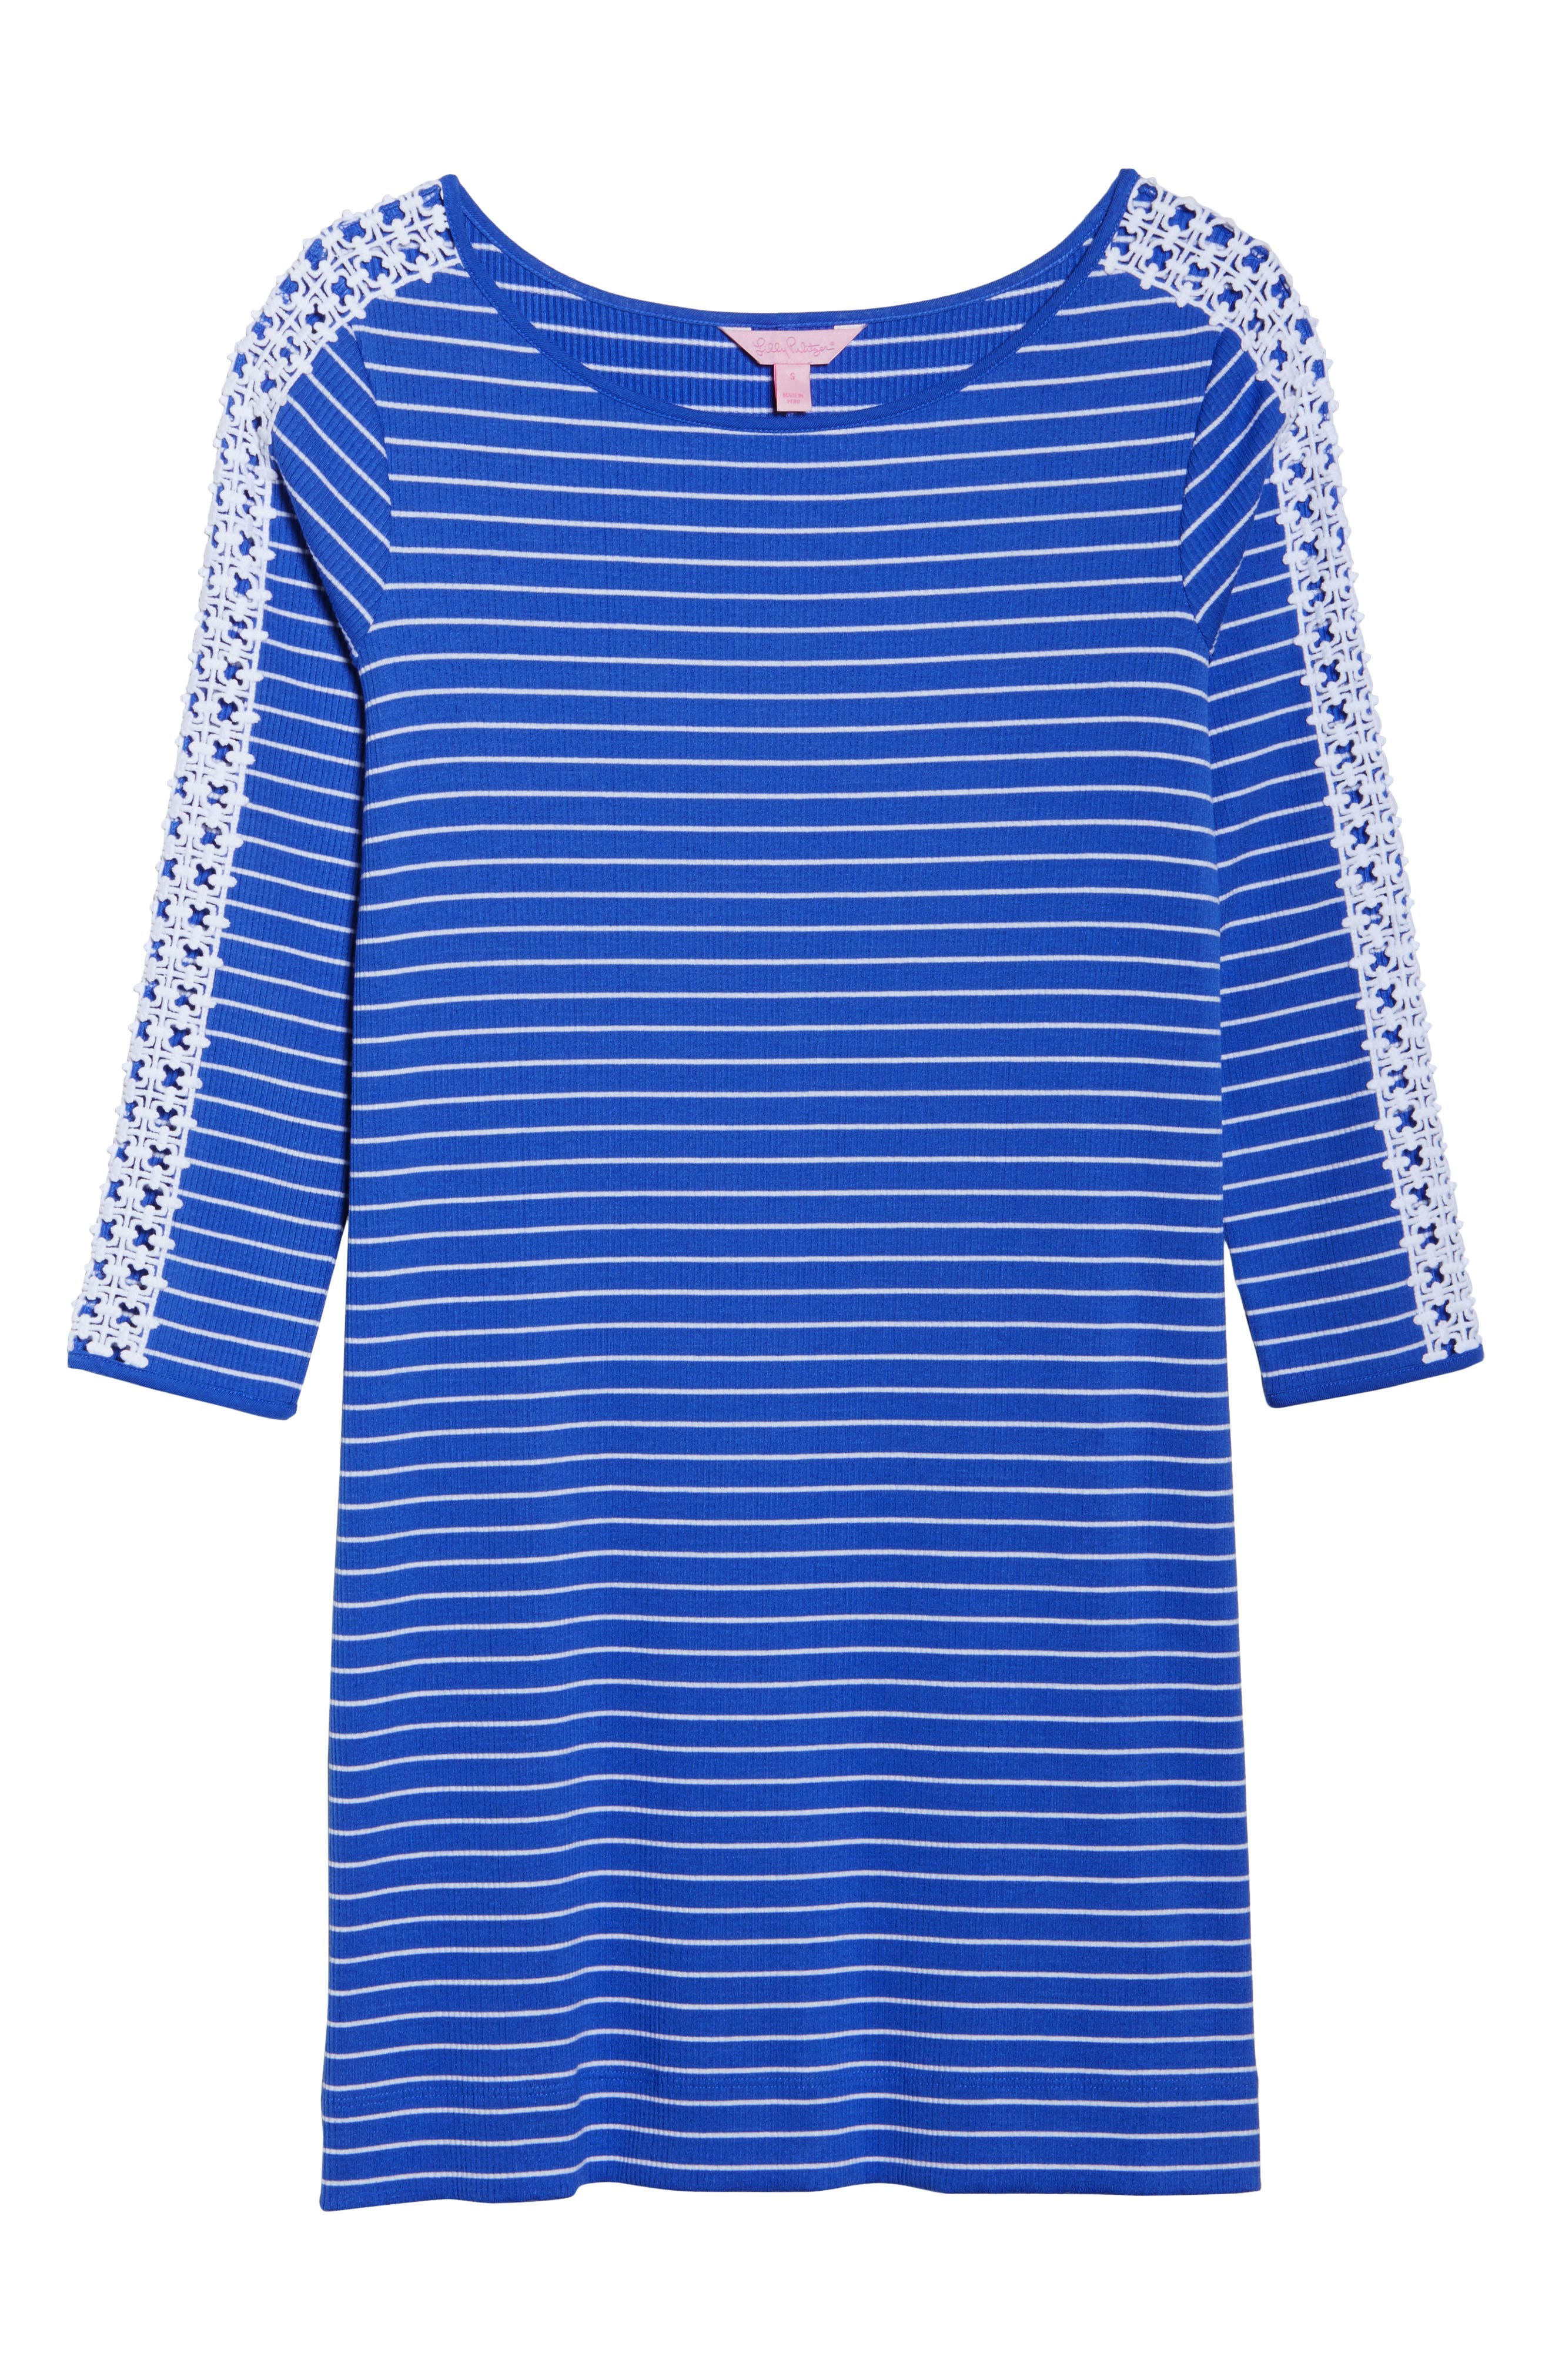 Marlowe Shift Dress,                             Alternate thumbnail 6, color,                             Beckon Blue Breeze Stripe